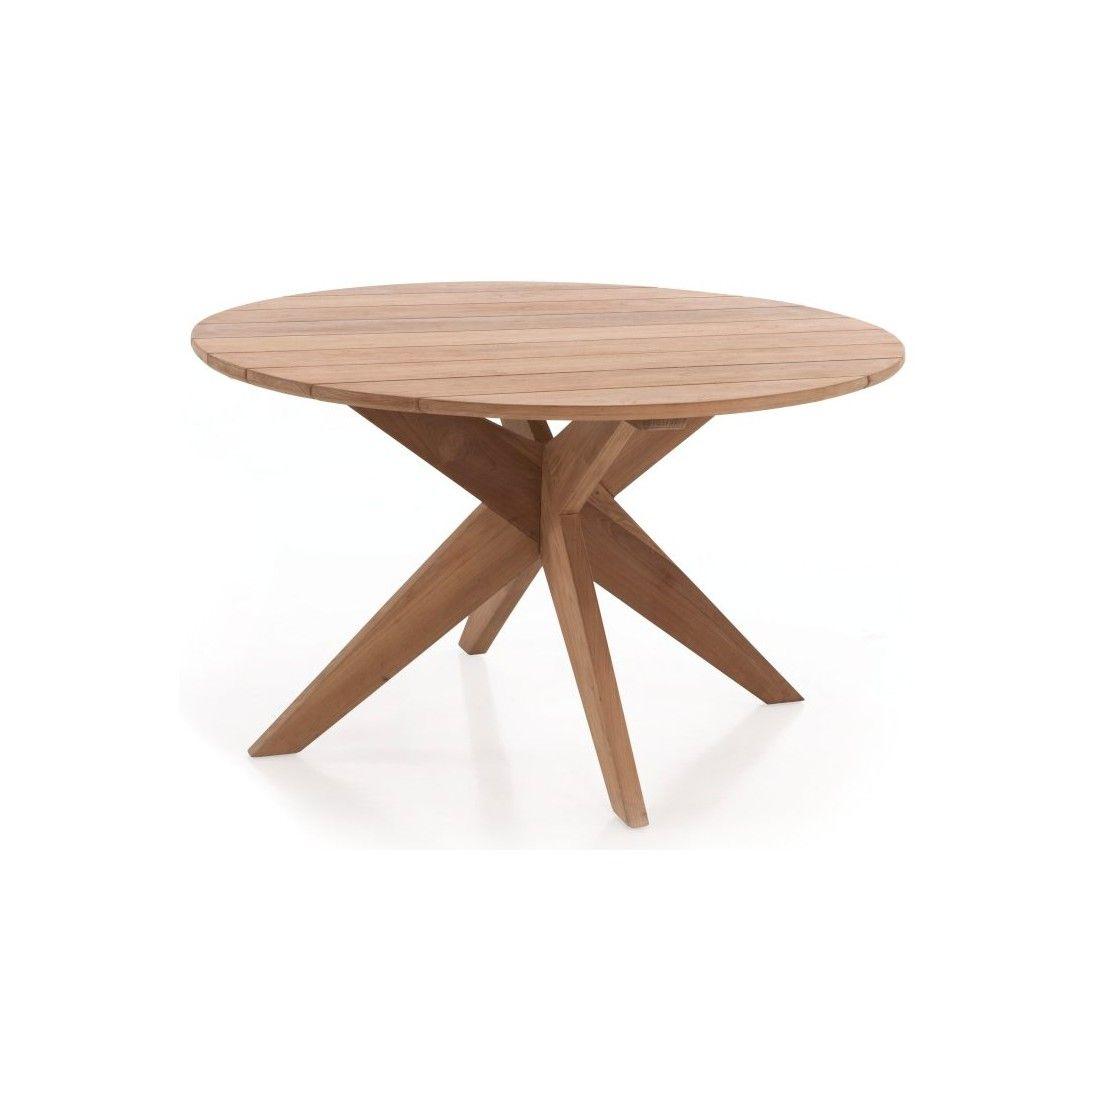 Table de jardin ronde en teck massif d 135 ou 165 cm, Java